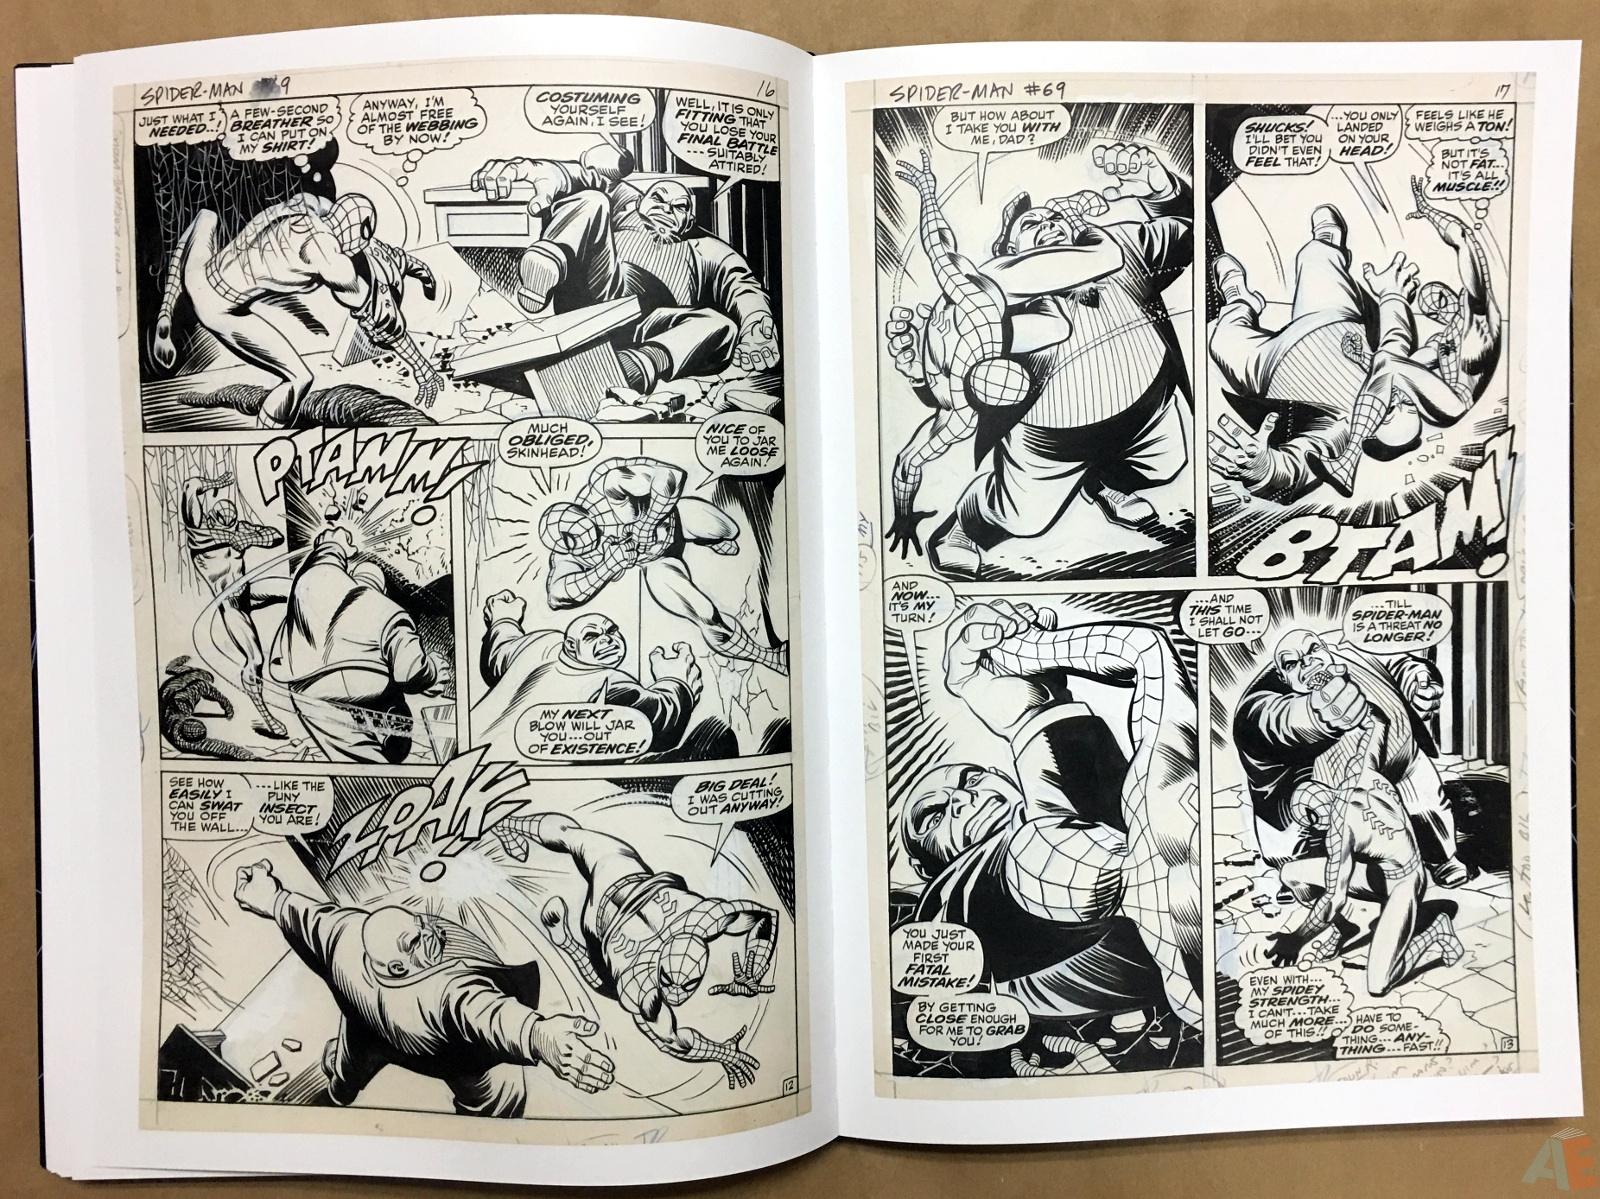 John Romita's The Amazing Spider-Man Artist's Edition 22